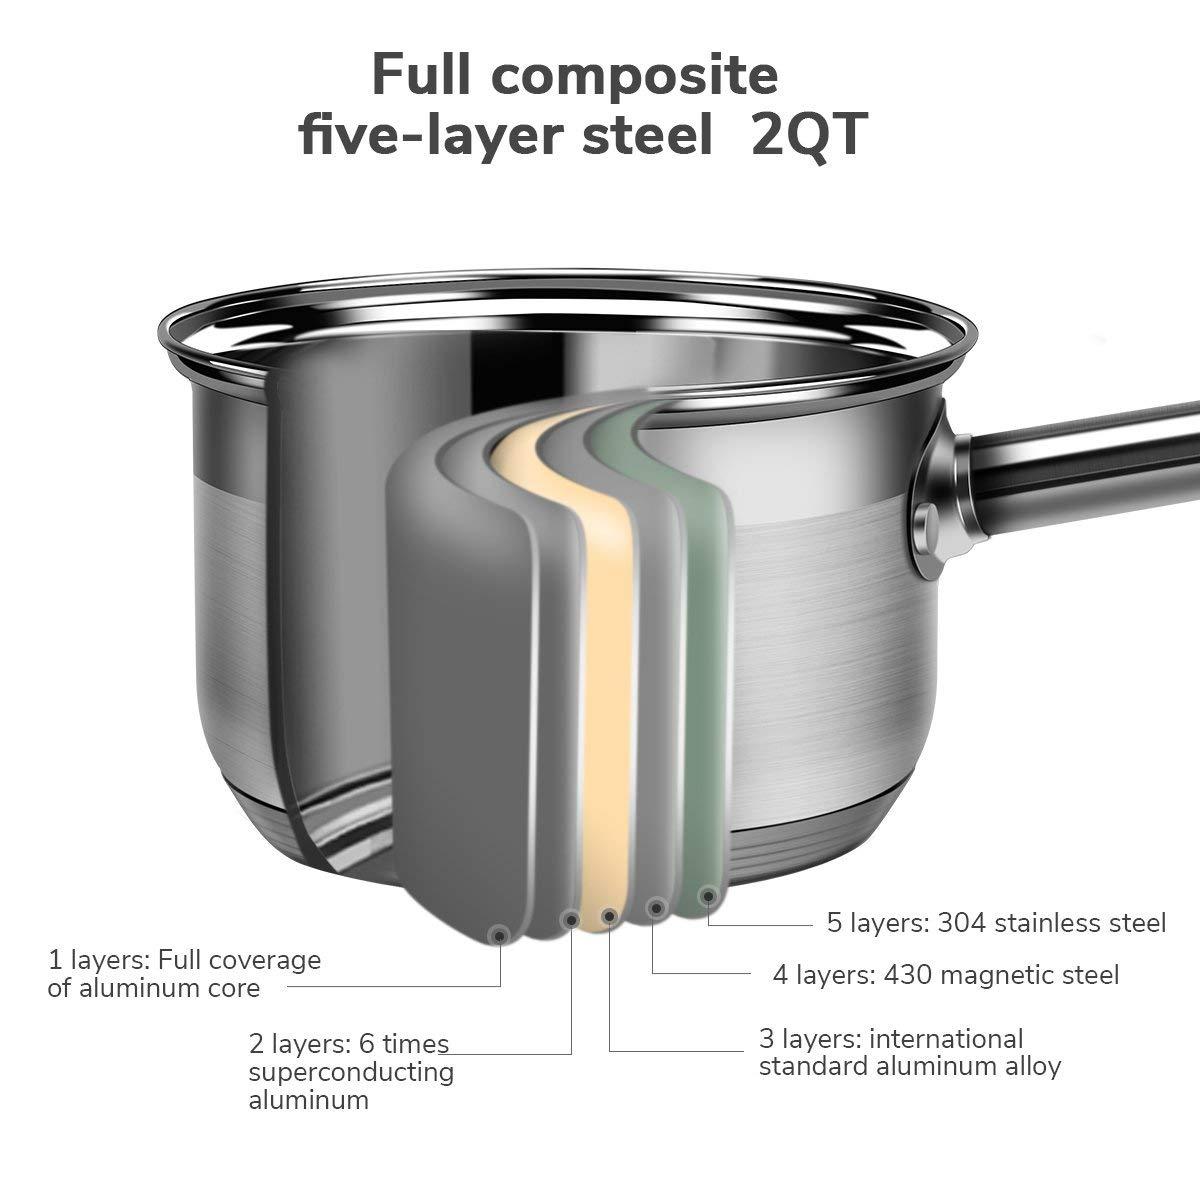 2 Quart Covered Saucepan with Aluminum Core Premium Stainless Steel Sauce Pan Dishwasher Safe Saucepan (2 Quart)